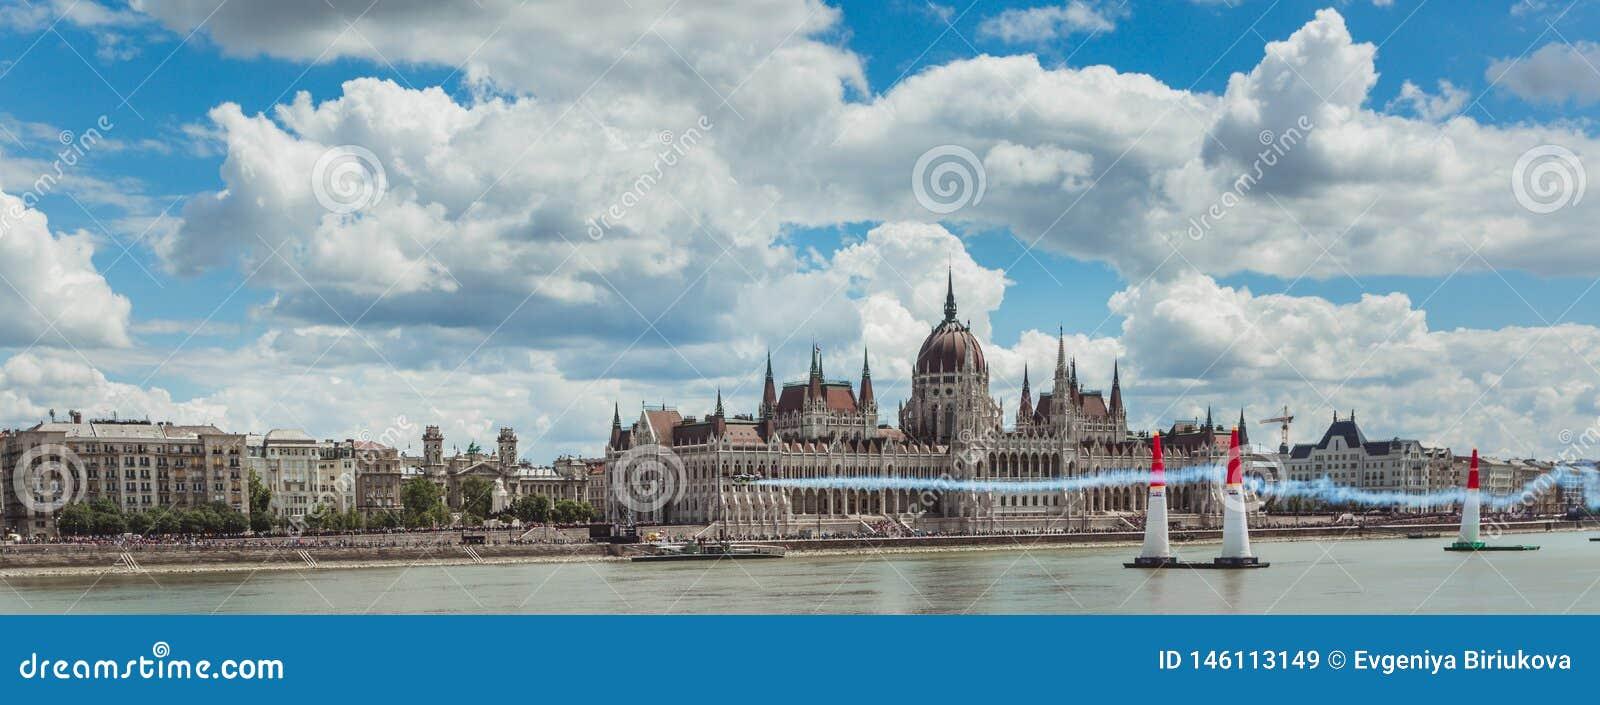 BUDAPEST UNGERN, JUNI 24 - 2018 - Red Bull luftlopp i mitten av huvudstaden Budapest, Ungern